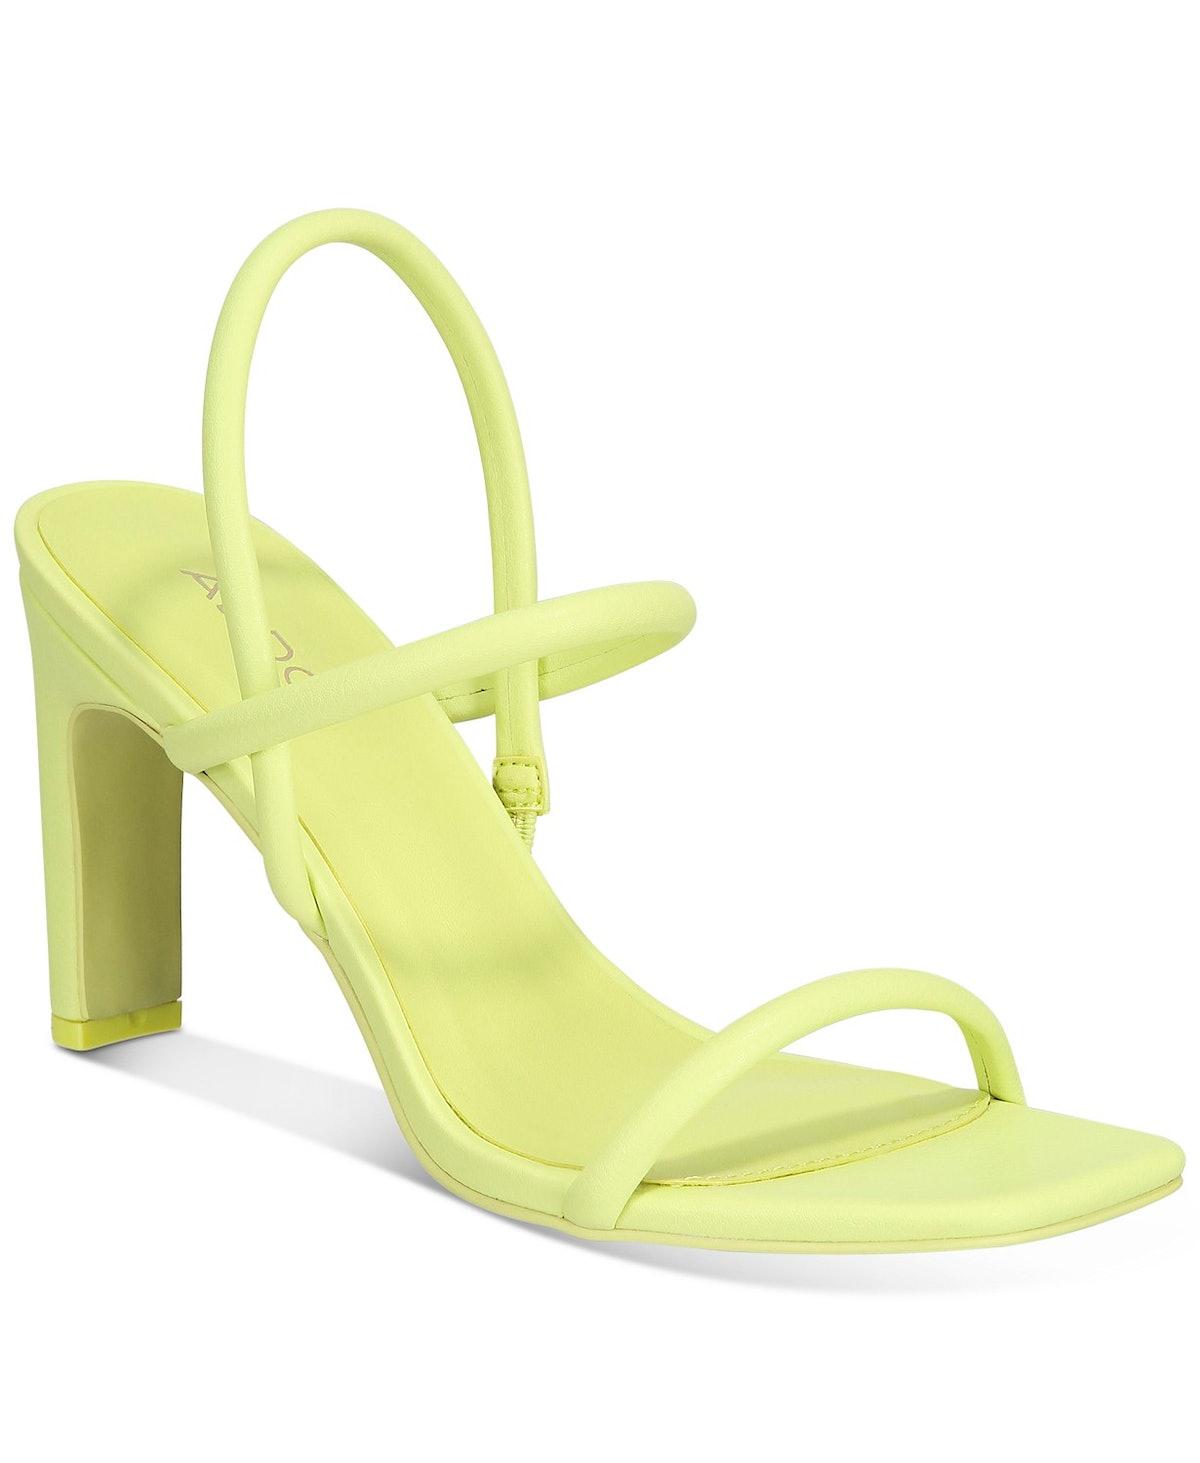 ALDO Women's Karla Square-Toe Barely There Dress Sandals